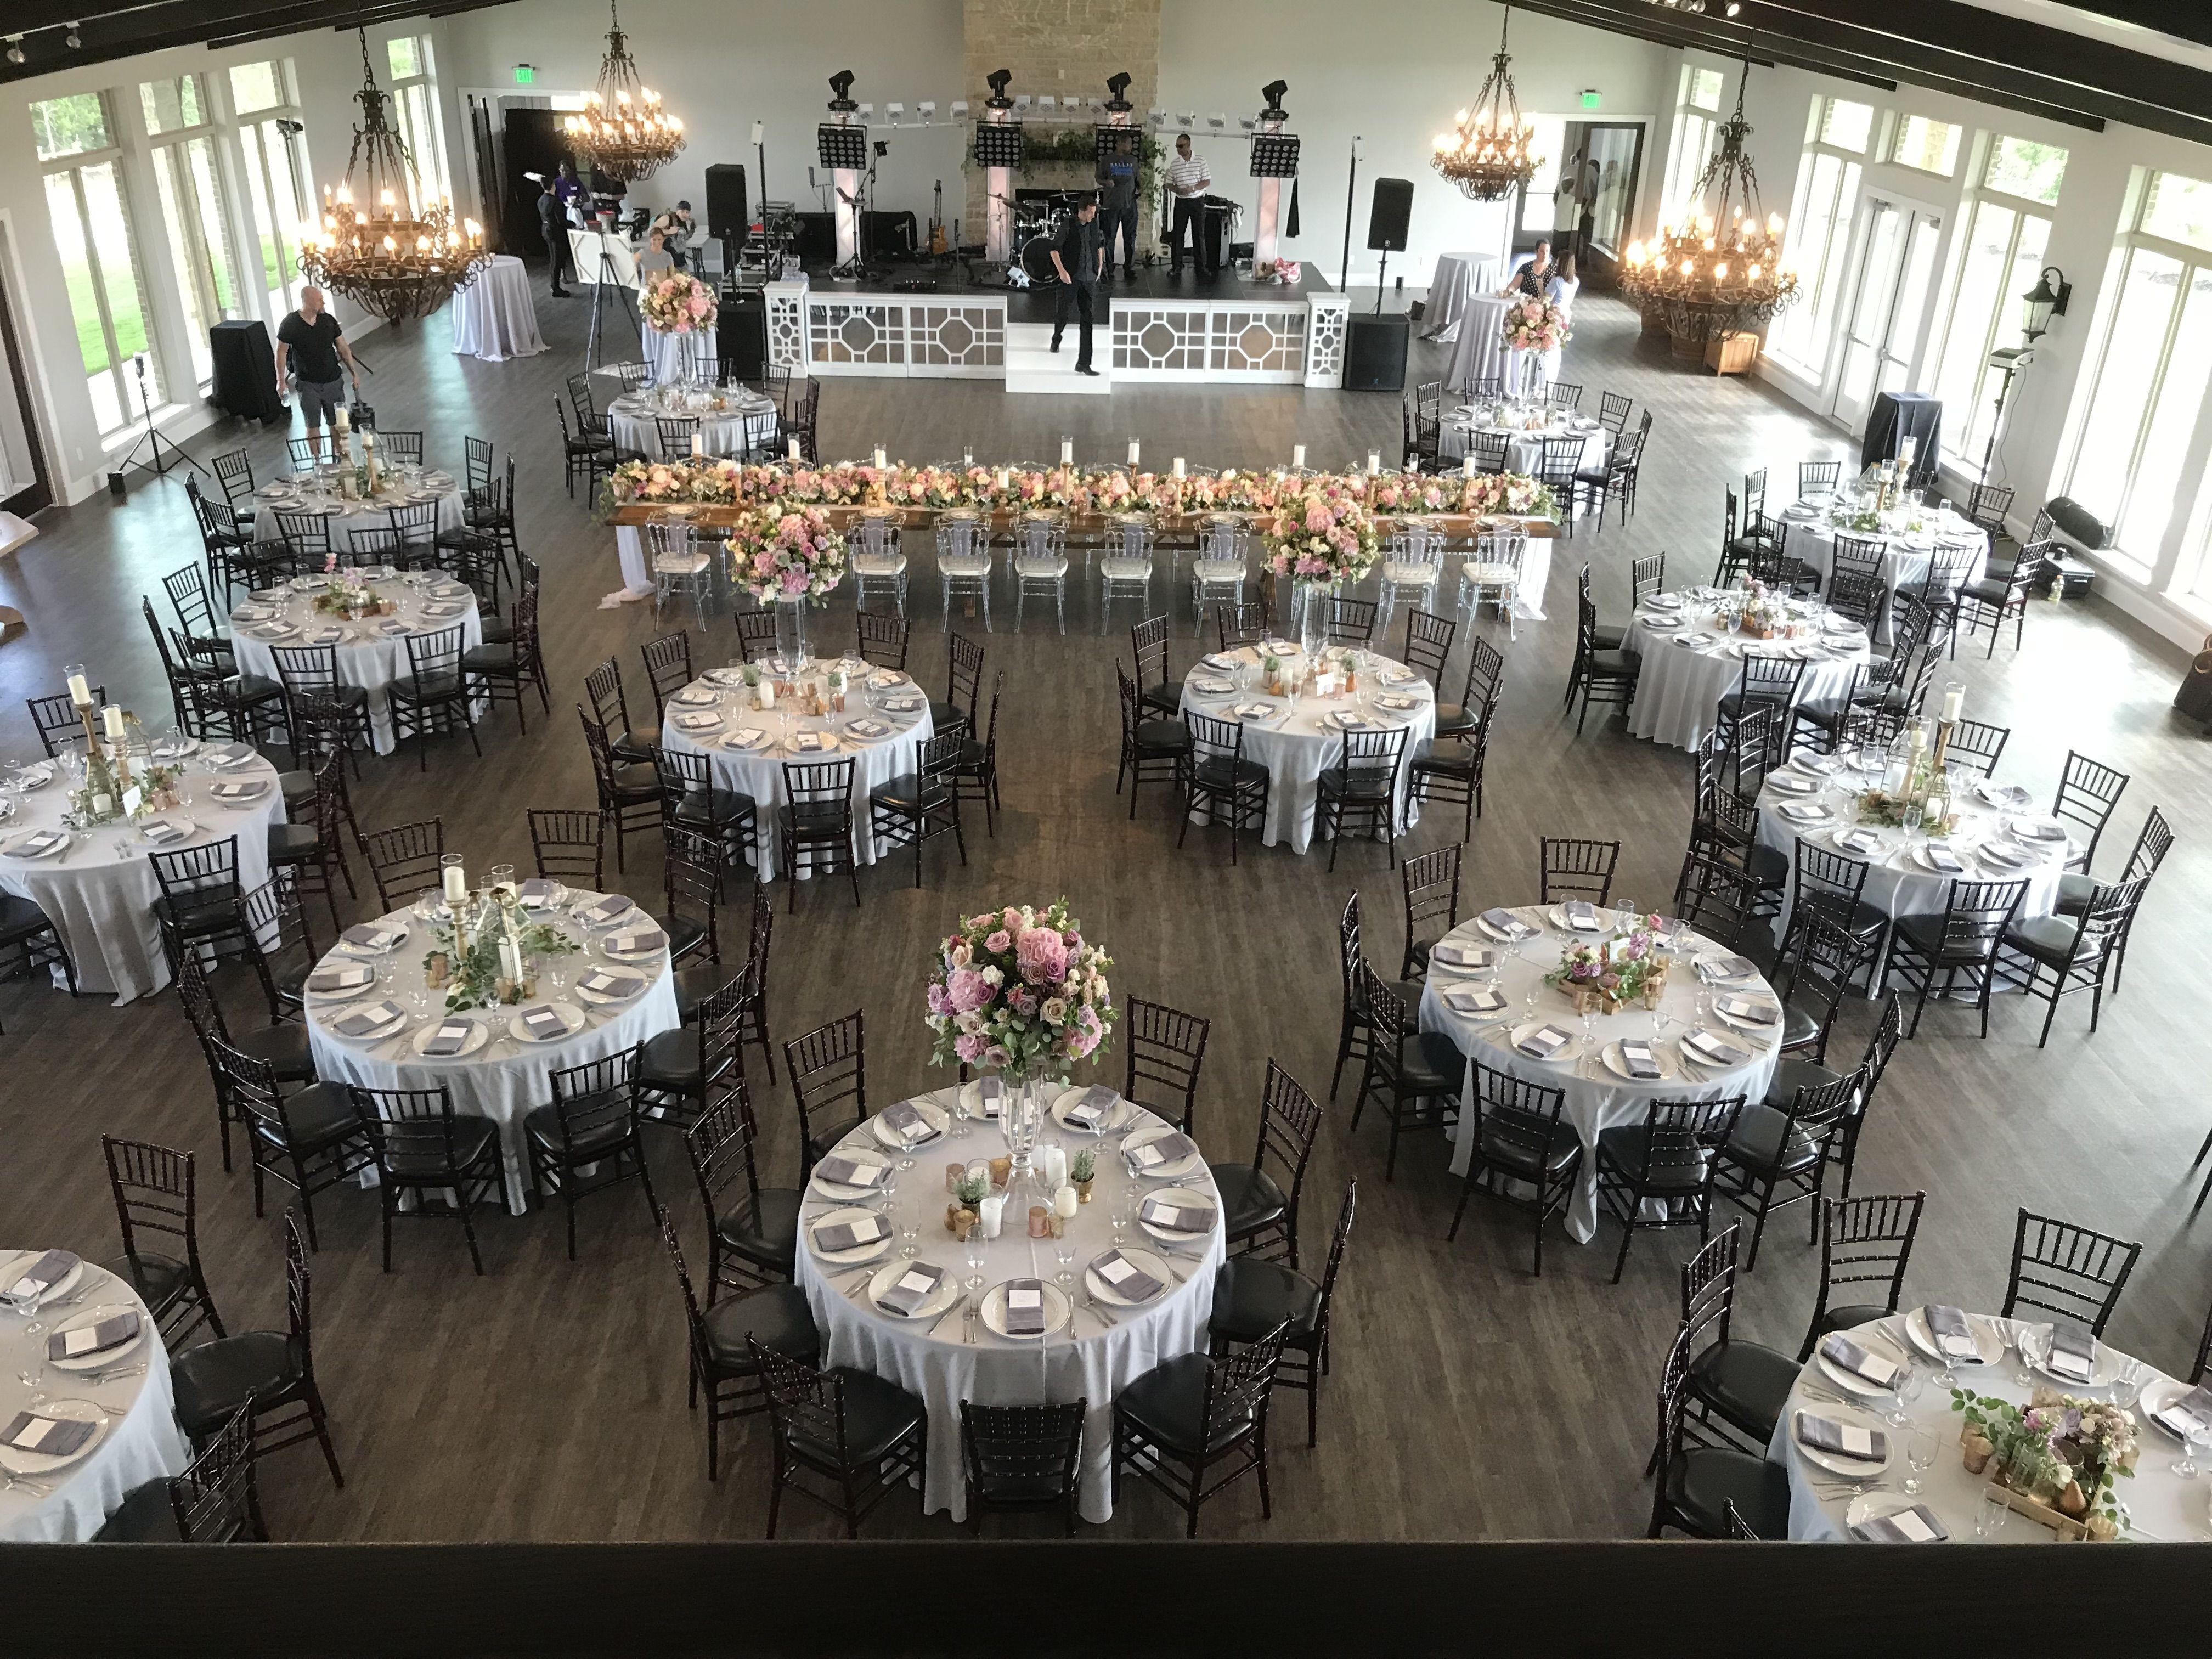 Elegant venue overlooking Texas hills Dove Ridge